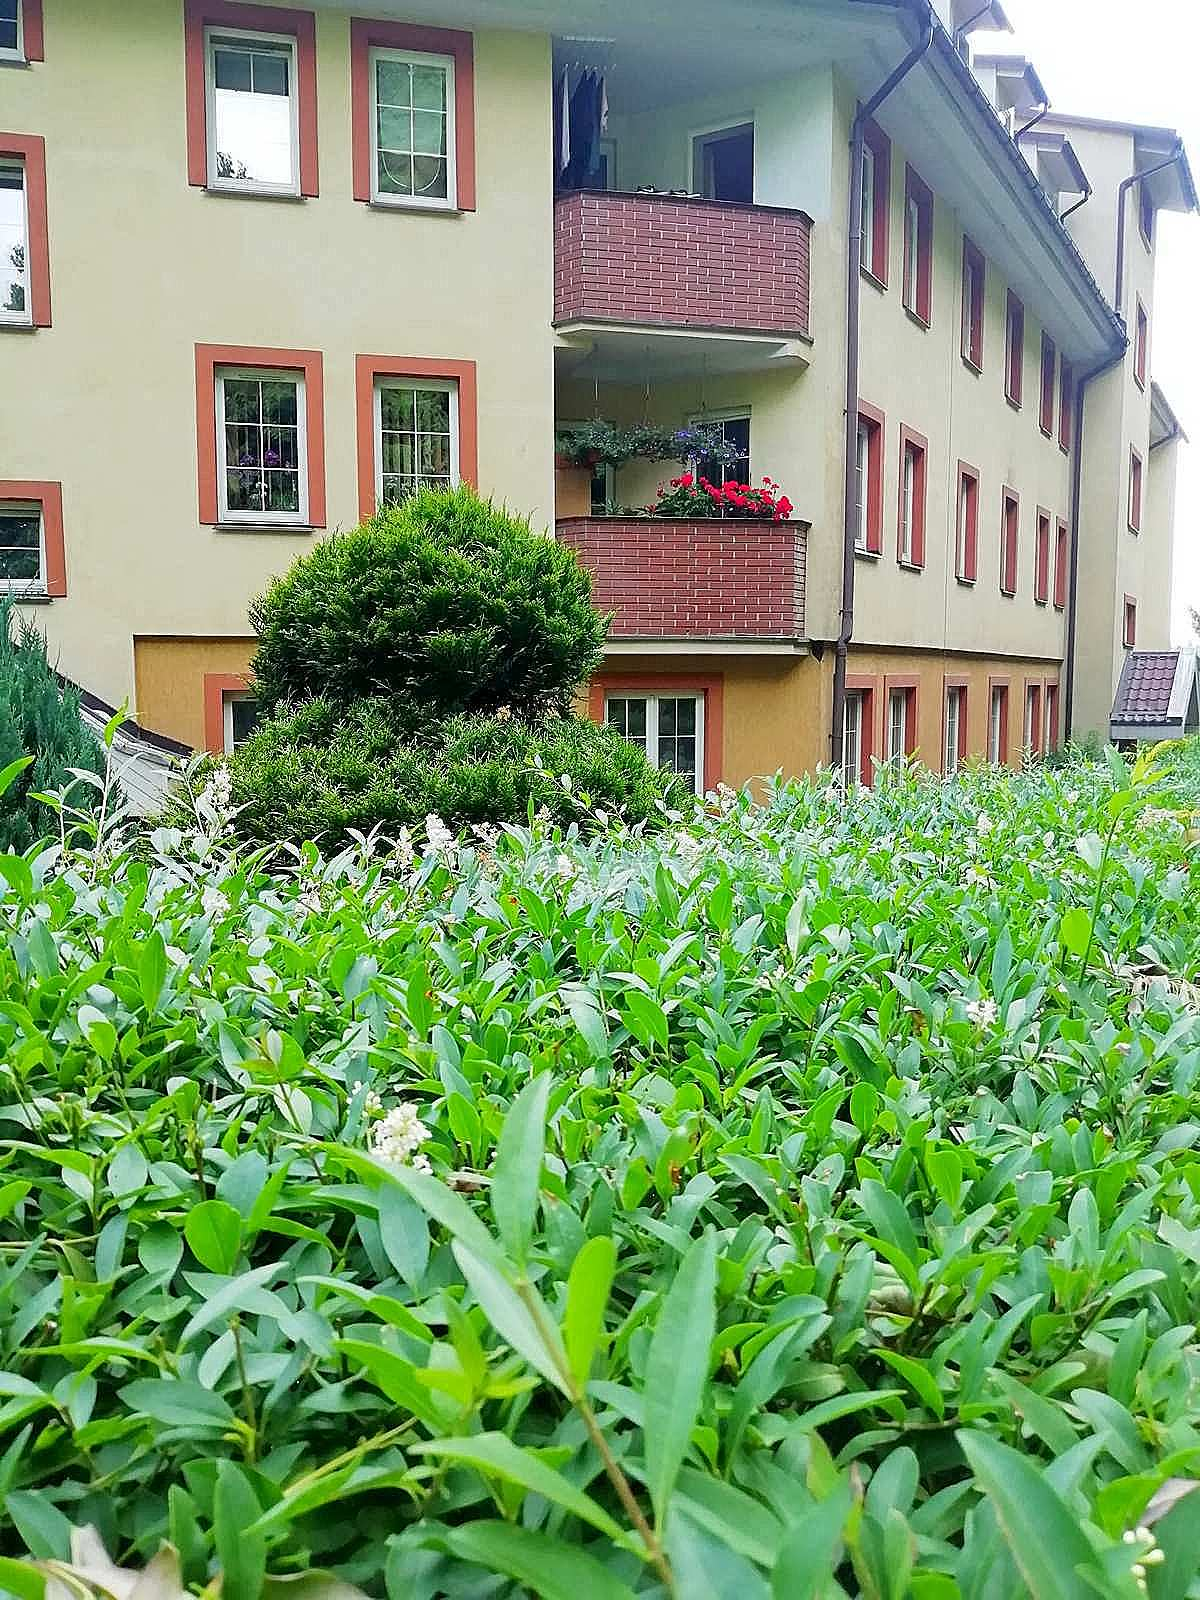 otoczenie apartamentu fabryka endorfin w kłodzku/surroundings apartment Fabryka Endorfin Klodzko